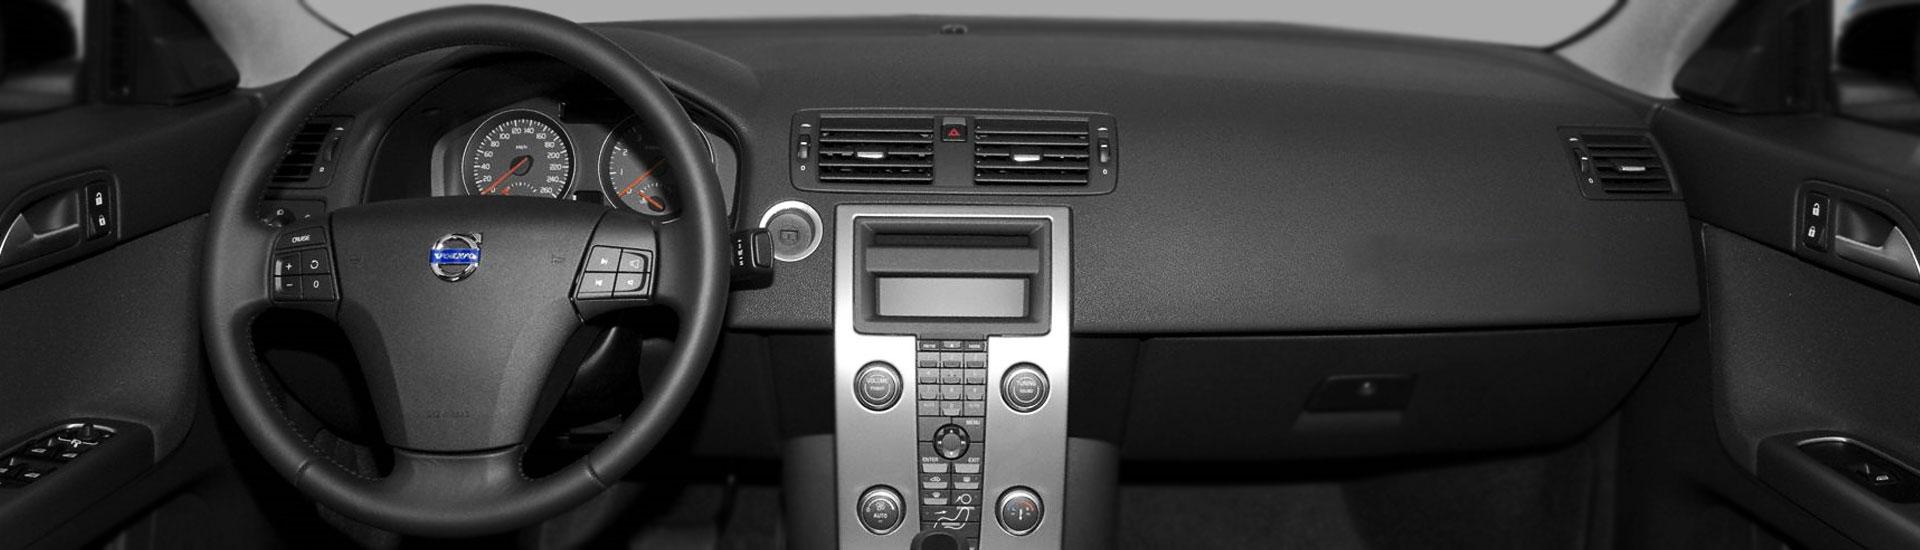 hight resolution of volvo s40 custom dash kits